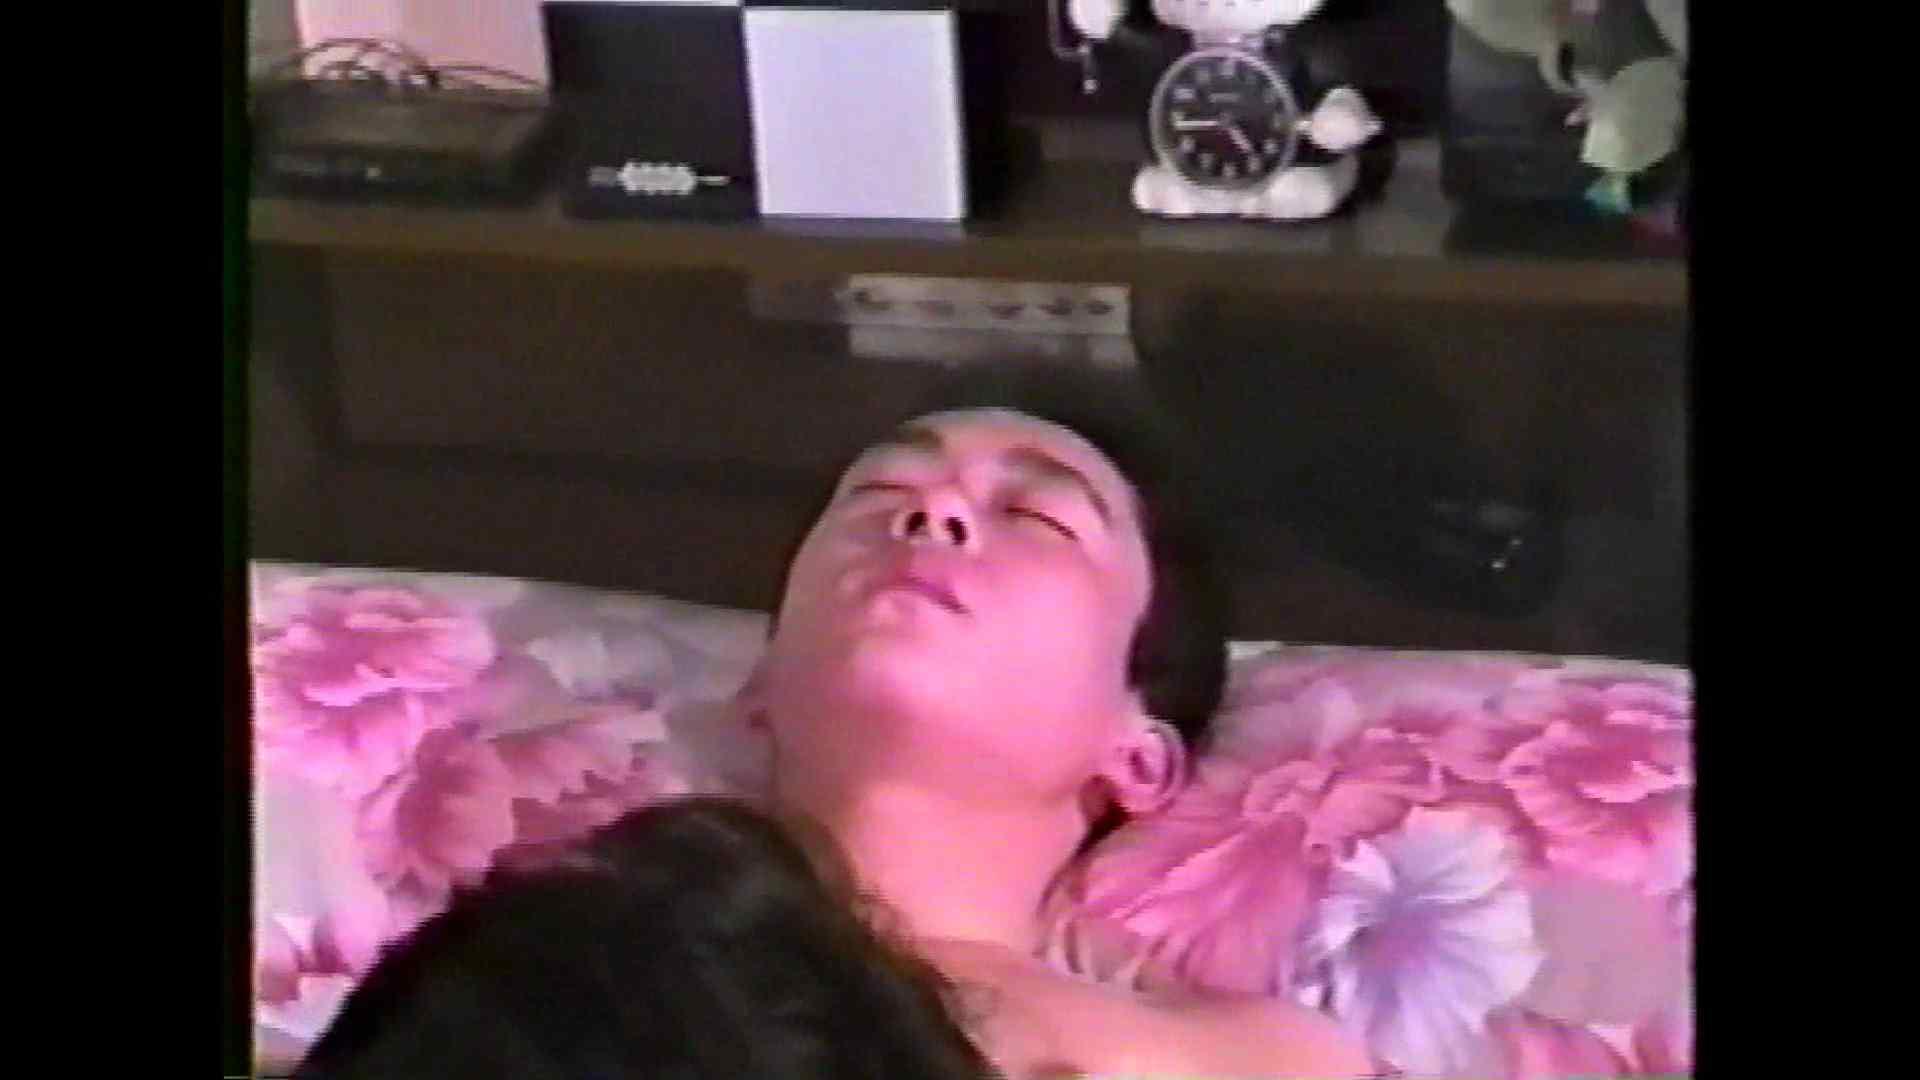 GAYBOY宏のオカズ倉庫Vol.2-1 仰天アナル ゲイエロ動画 64pic 6